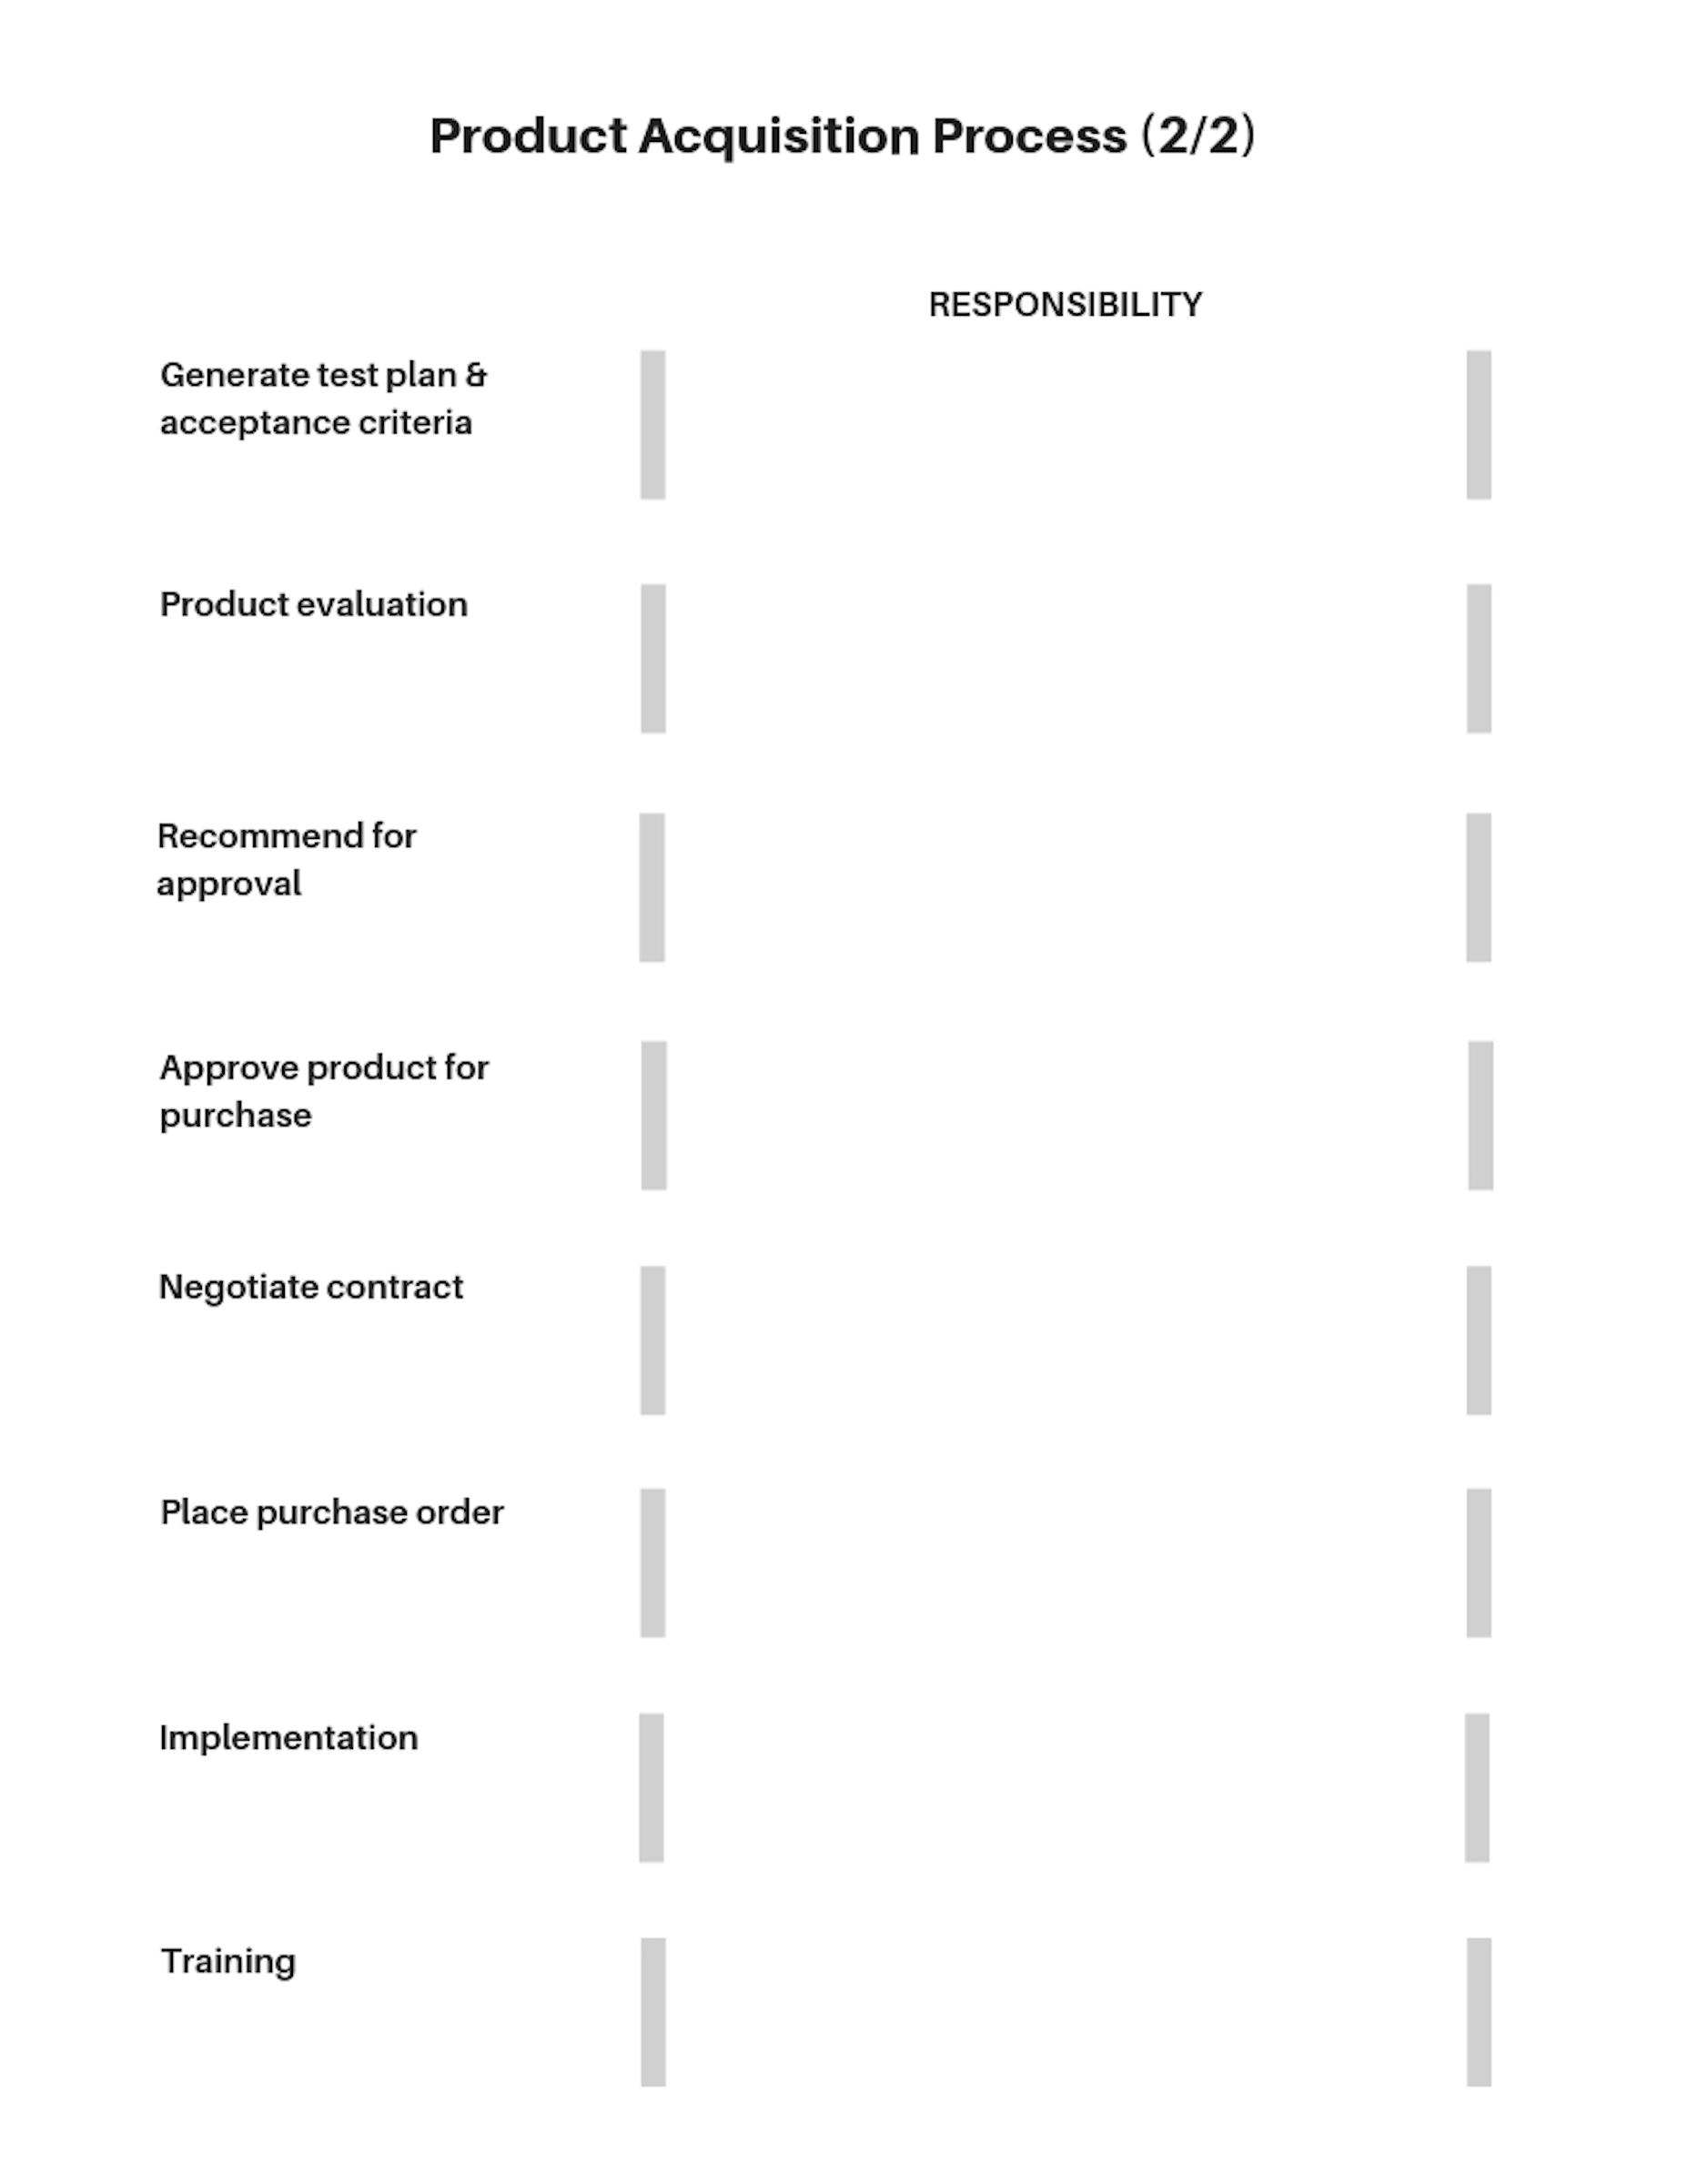 Product Acquisition Process